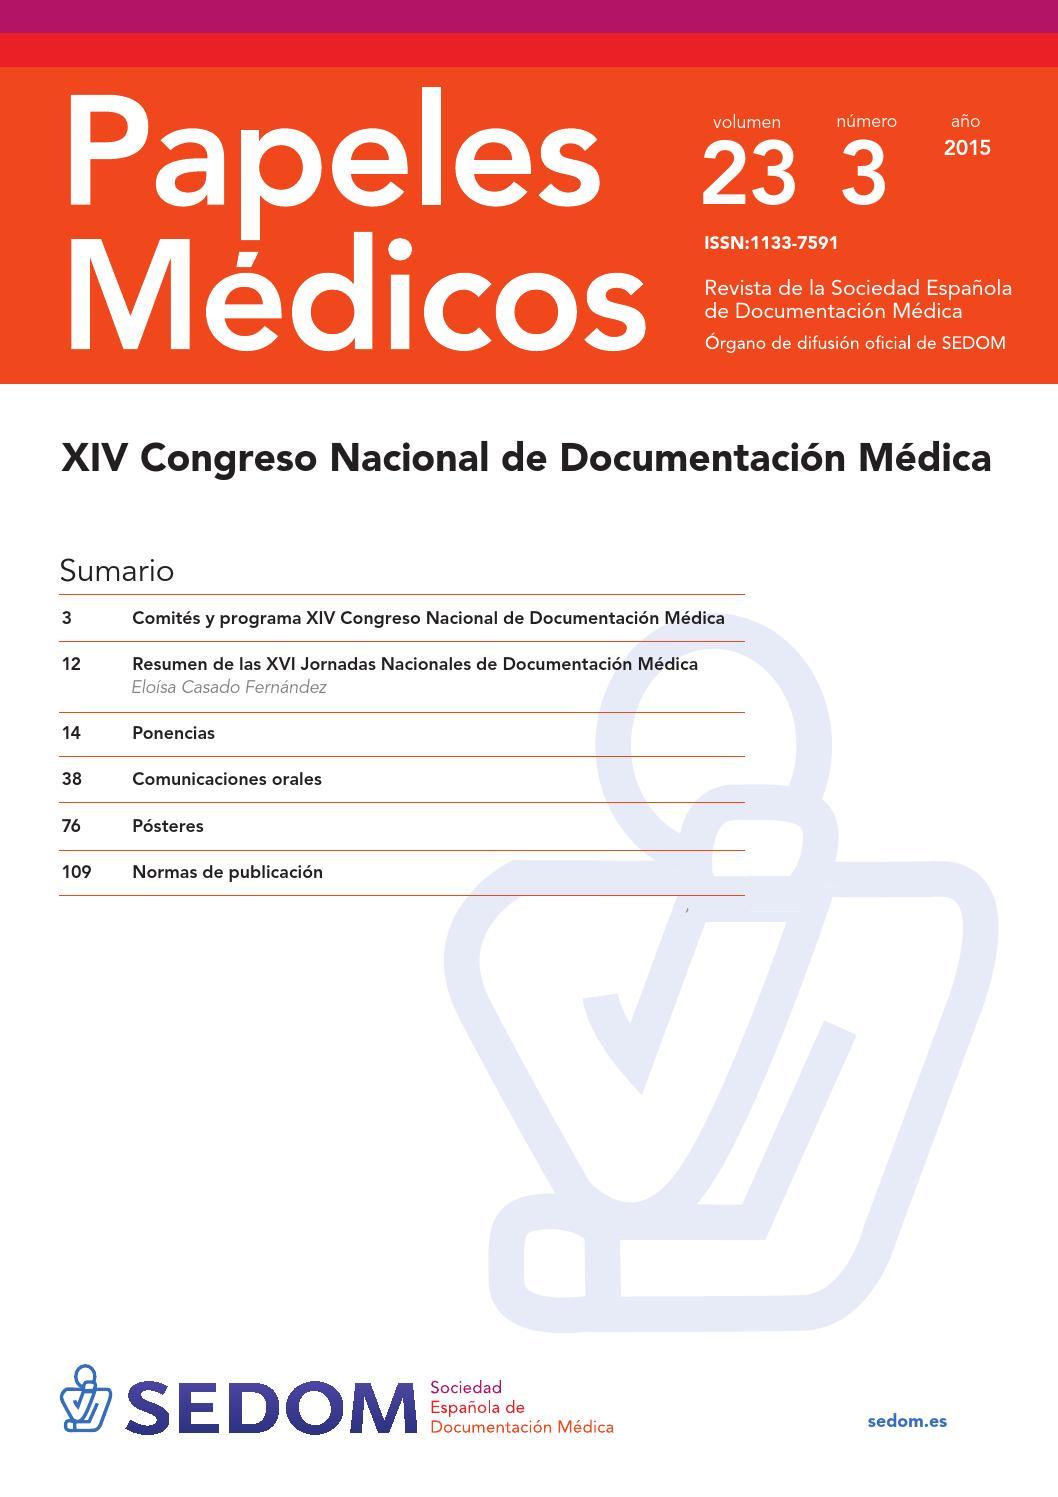 Papeles medicos 23 - 3 by SEDOM web - issuu